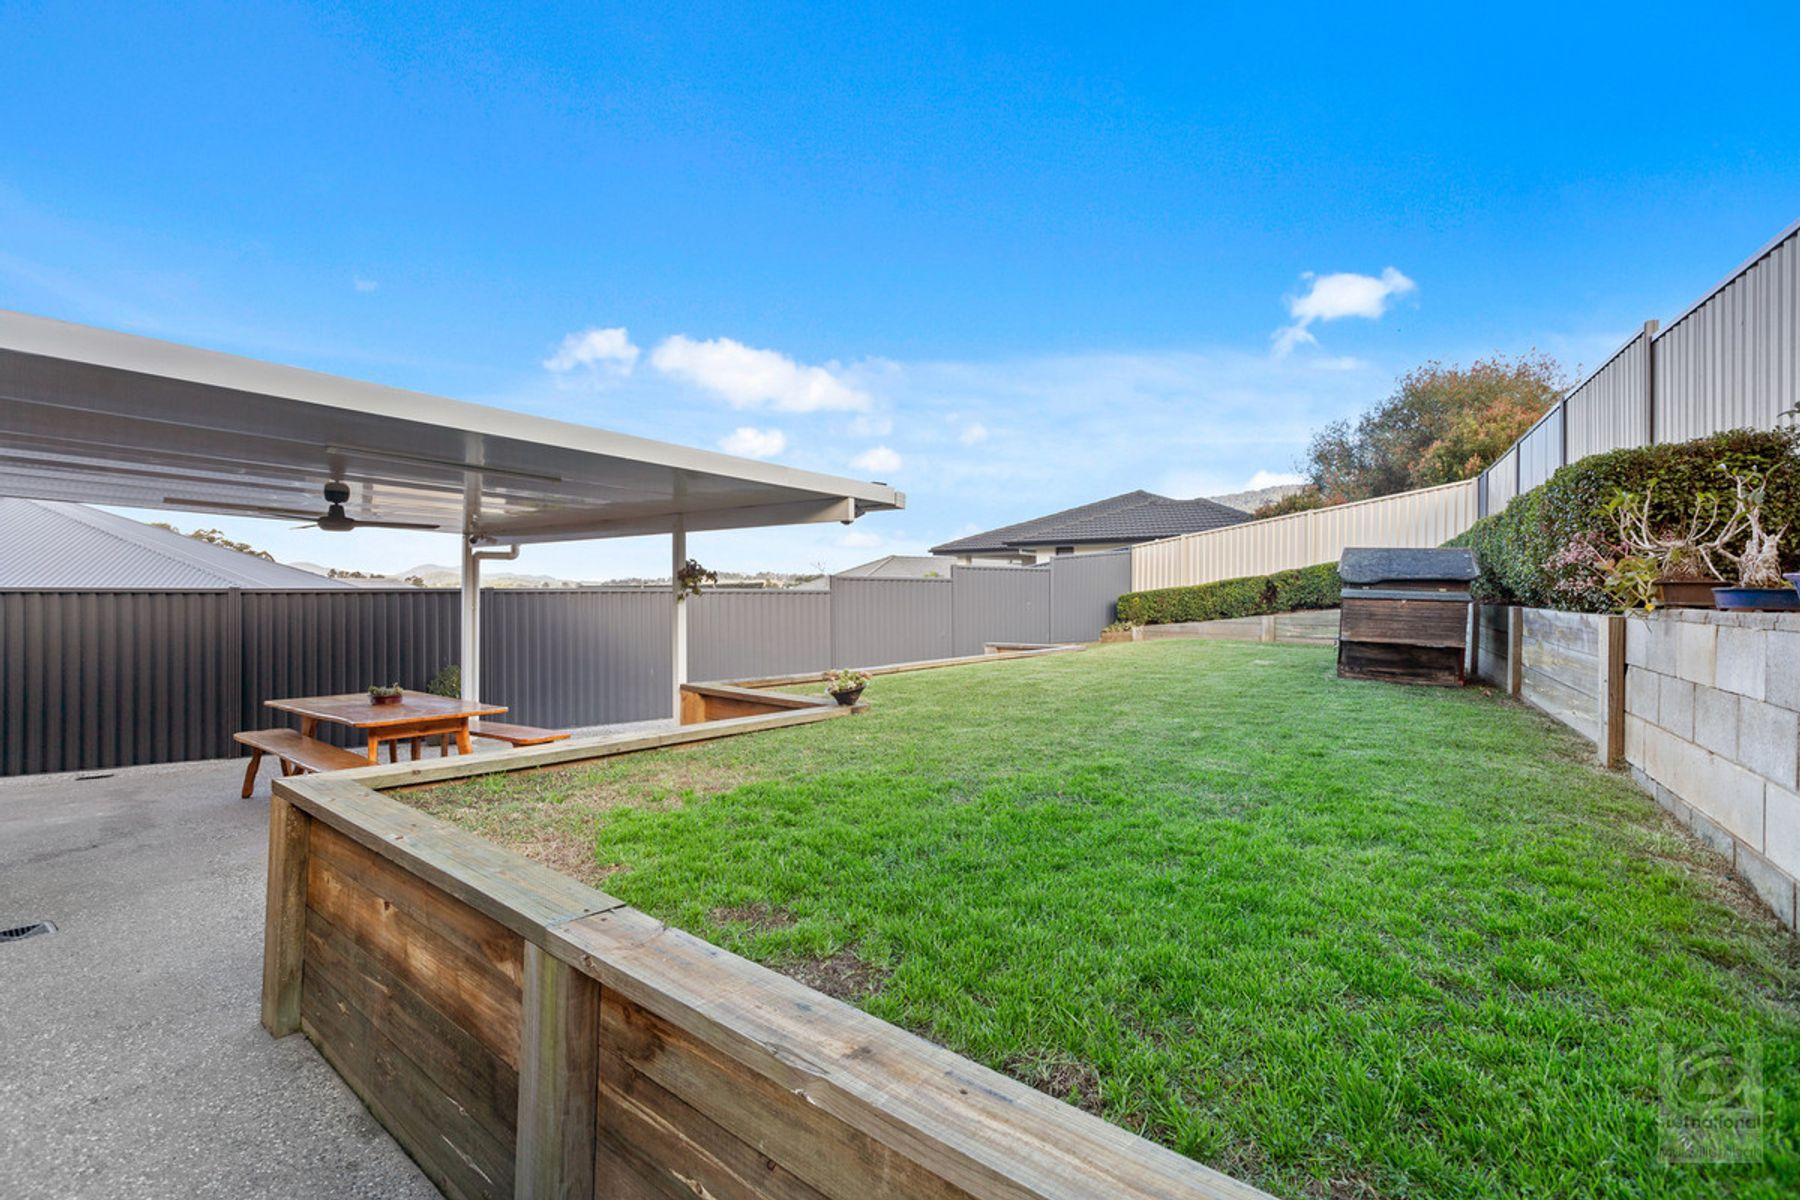 113 Riveroak Drive, Murwillumbah, NSW 2484